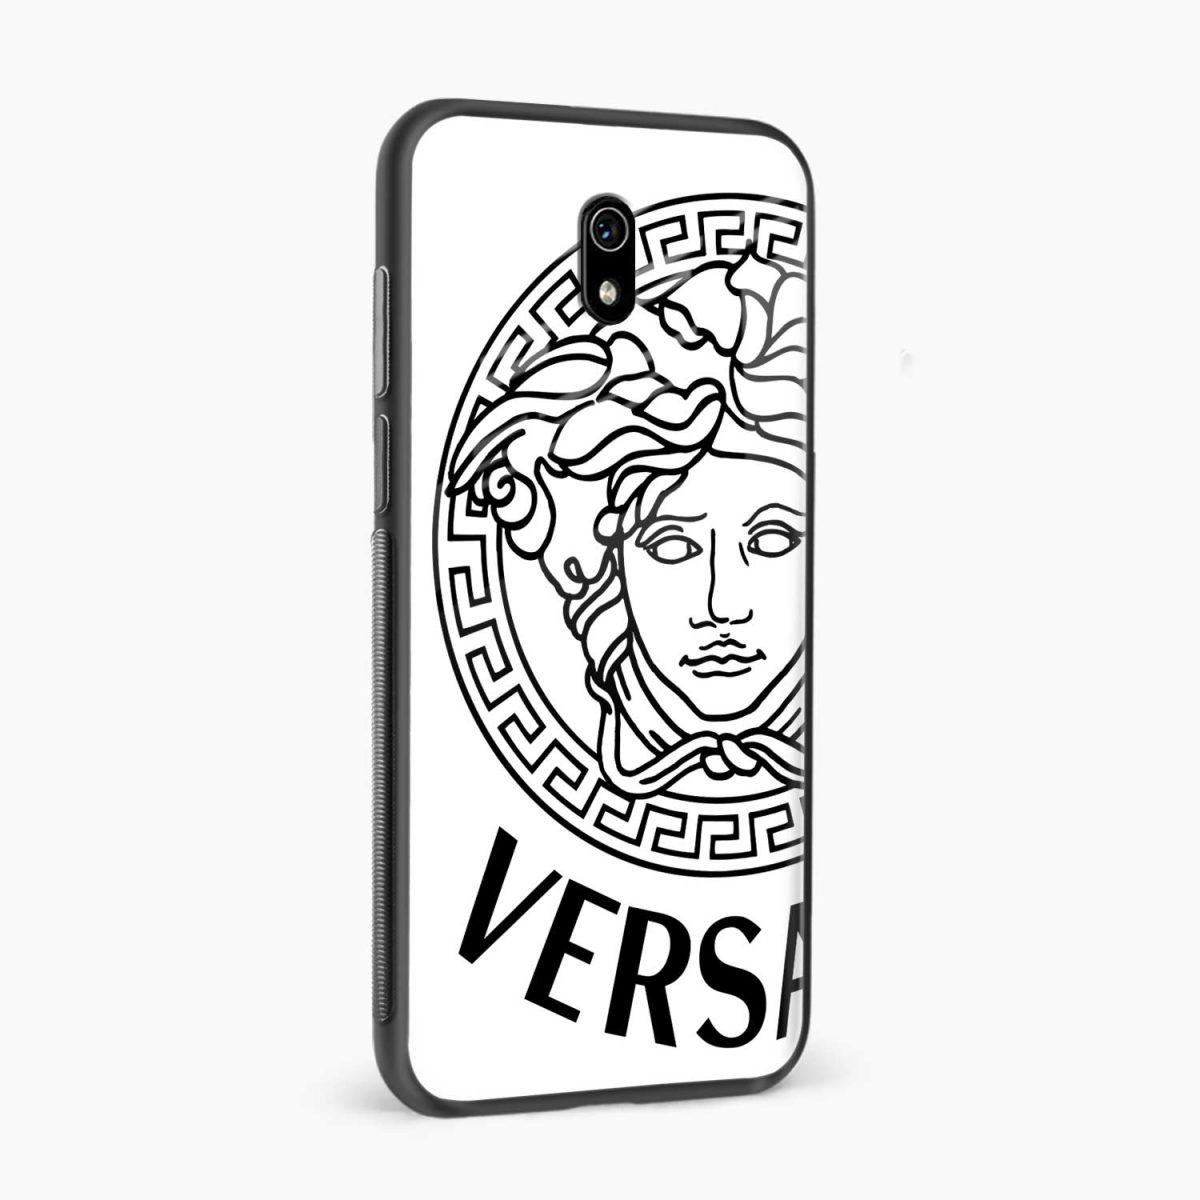 versace black white side view redmi 8a back cover